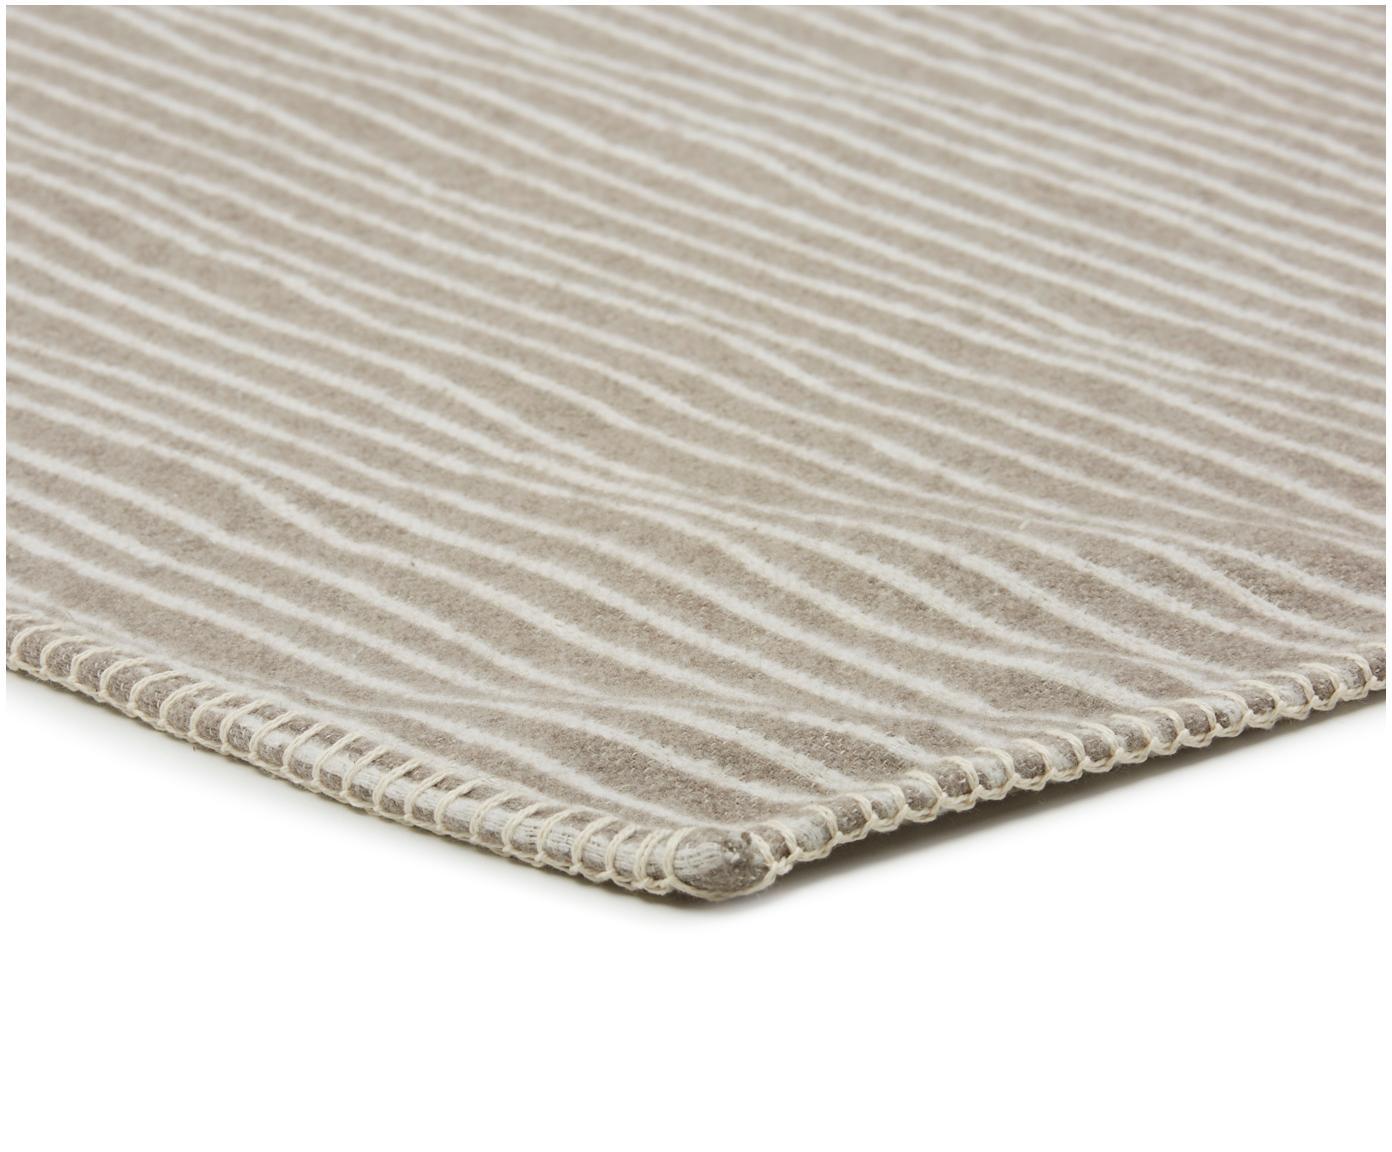 Plaid Nova Stripes, 85%Baumwolle, 8%Viskose, 7%Polyacryl, Rauchgrau, Weiß, 145 x 220 cm